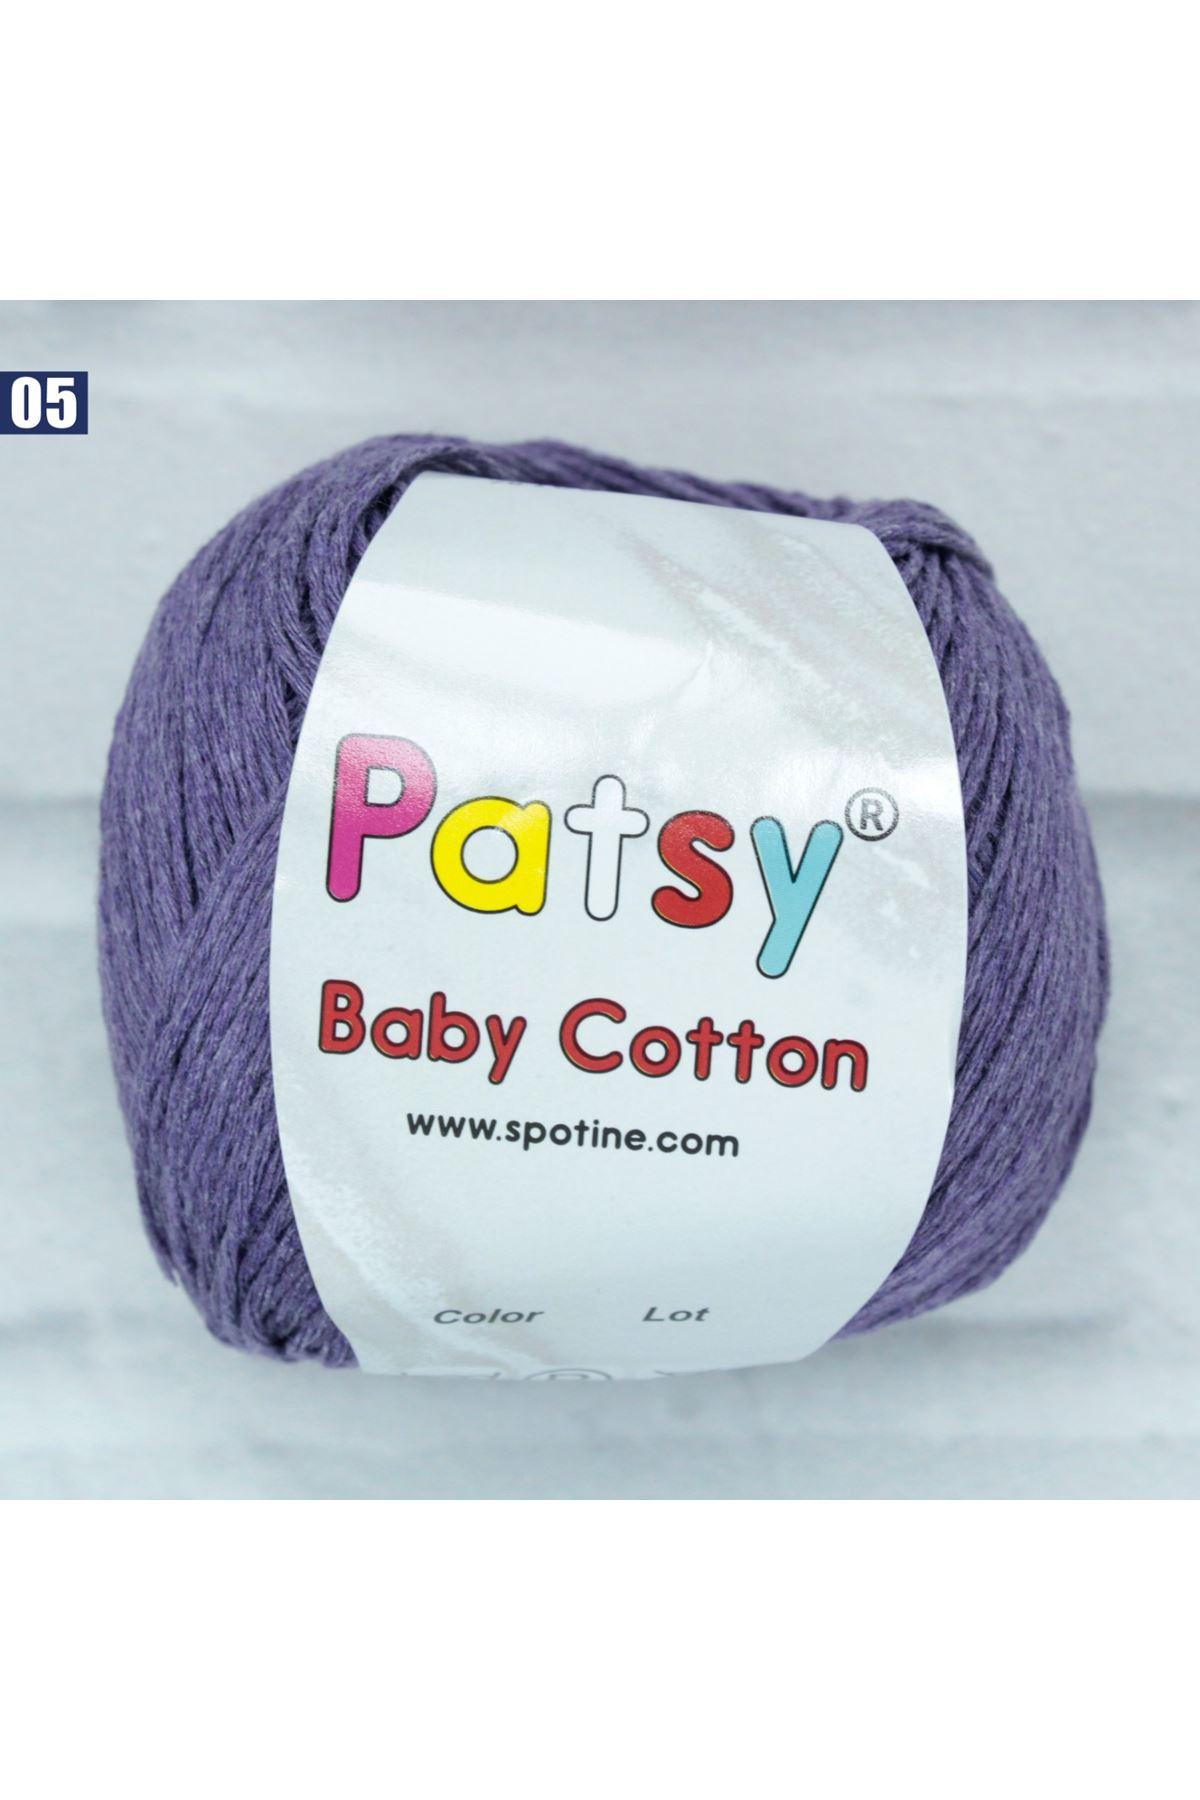 Patsy Baby Cotton 05